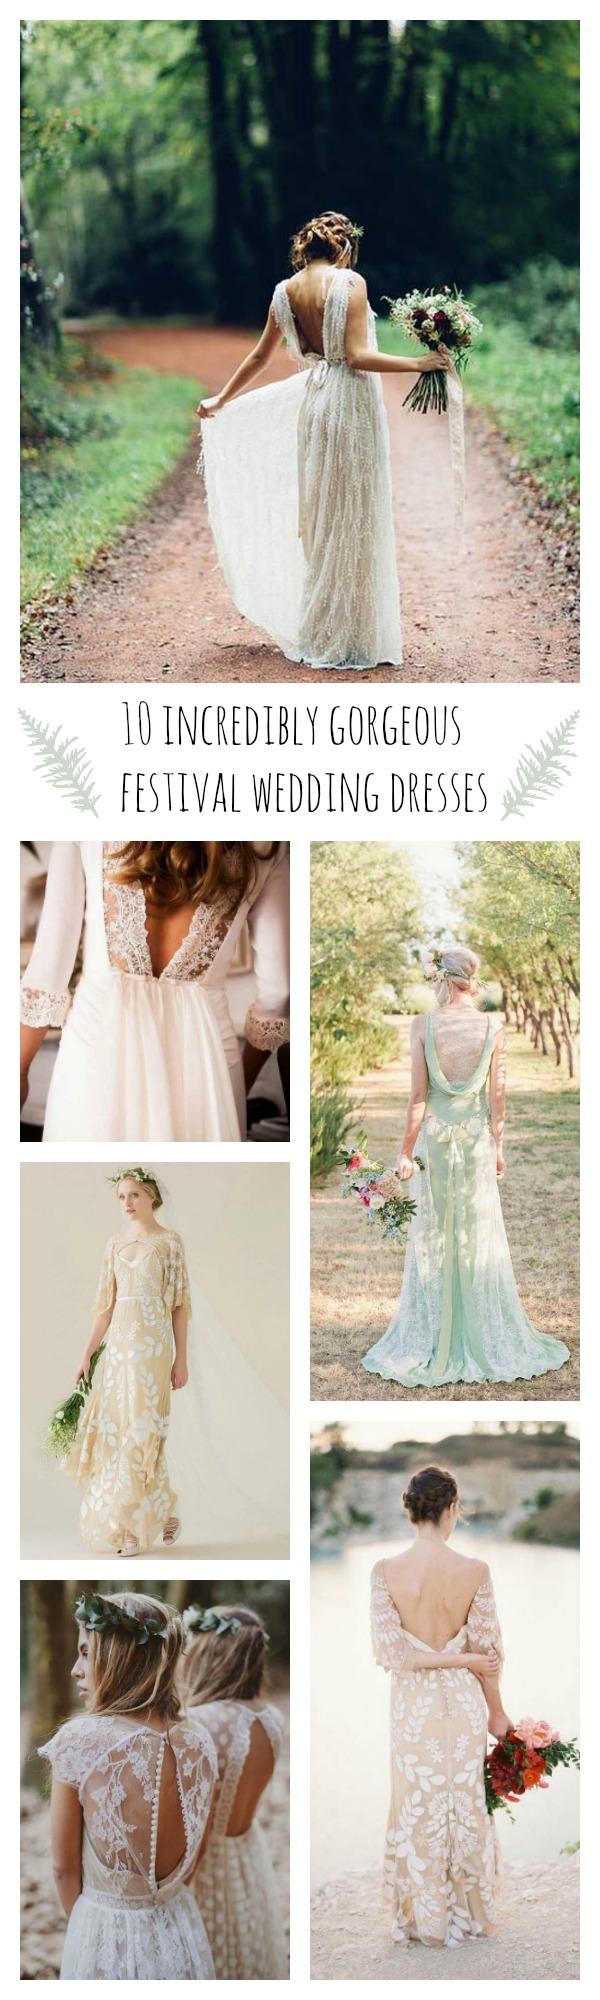 10 best festival bride wedding dresses